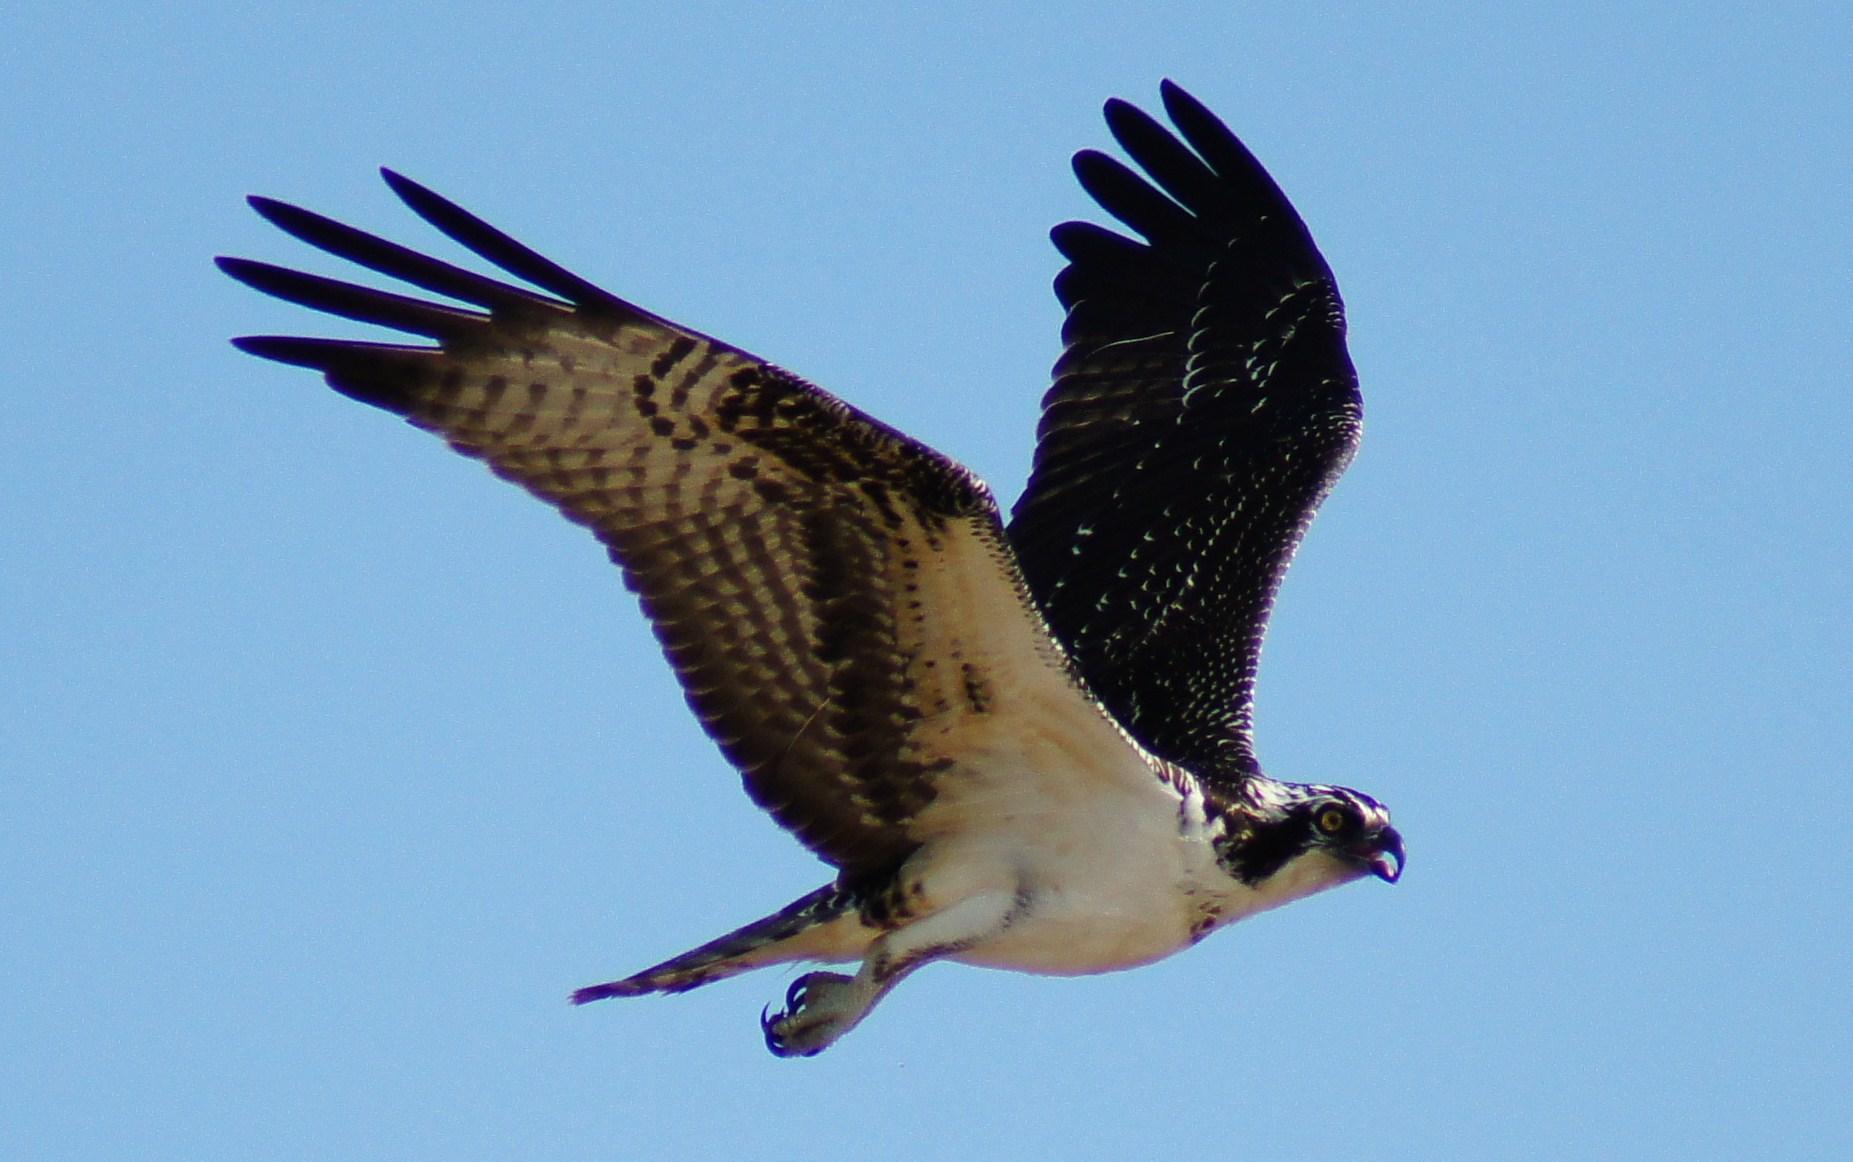 desert hawk diagram nissan sentra wiring 2016 eagle vs falcon